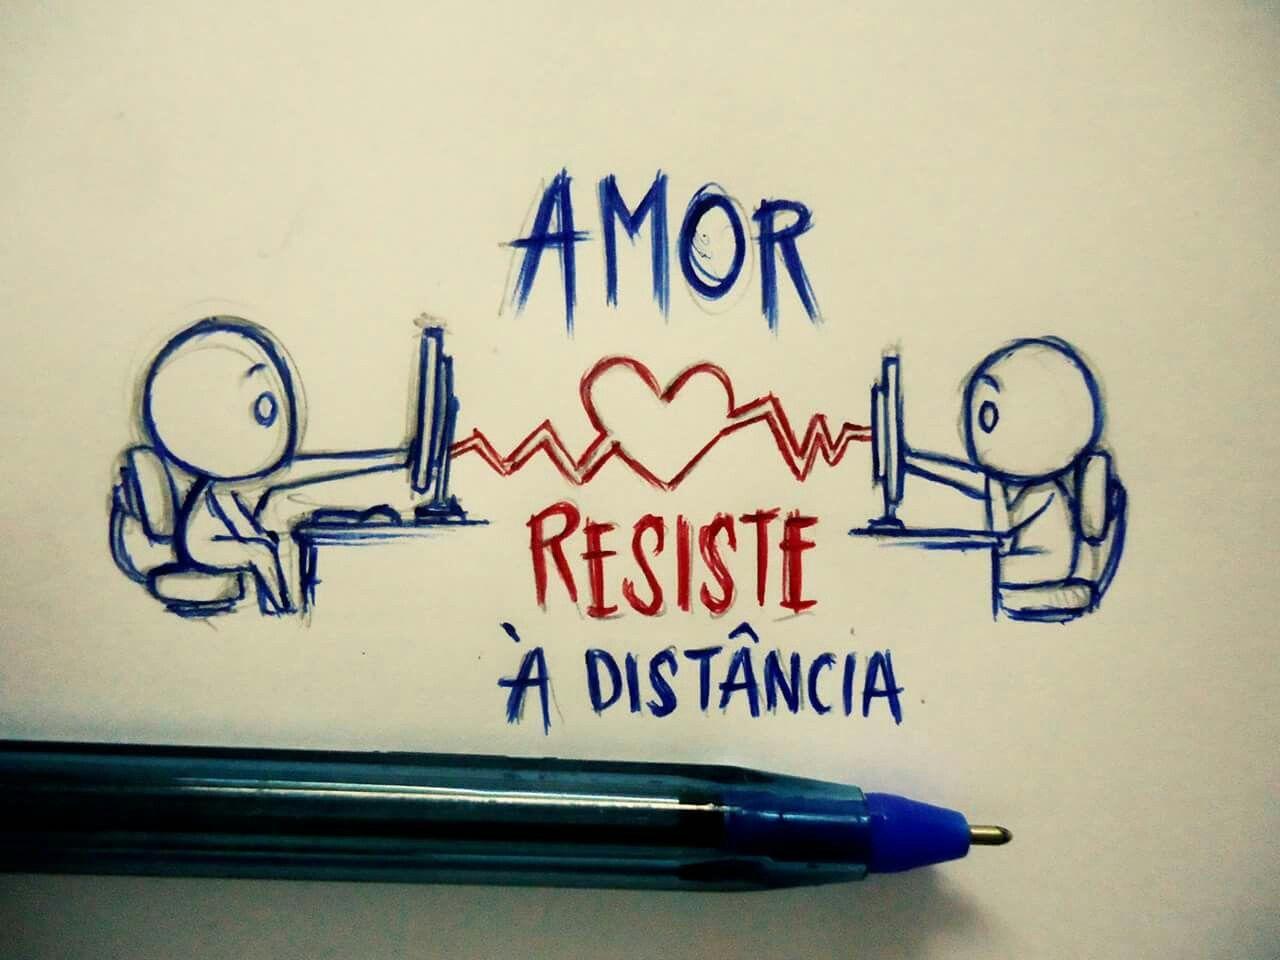 Frases · O Amor resiste  dist¢ncia